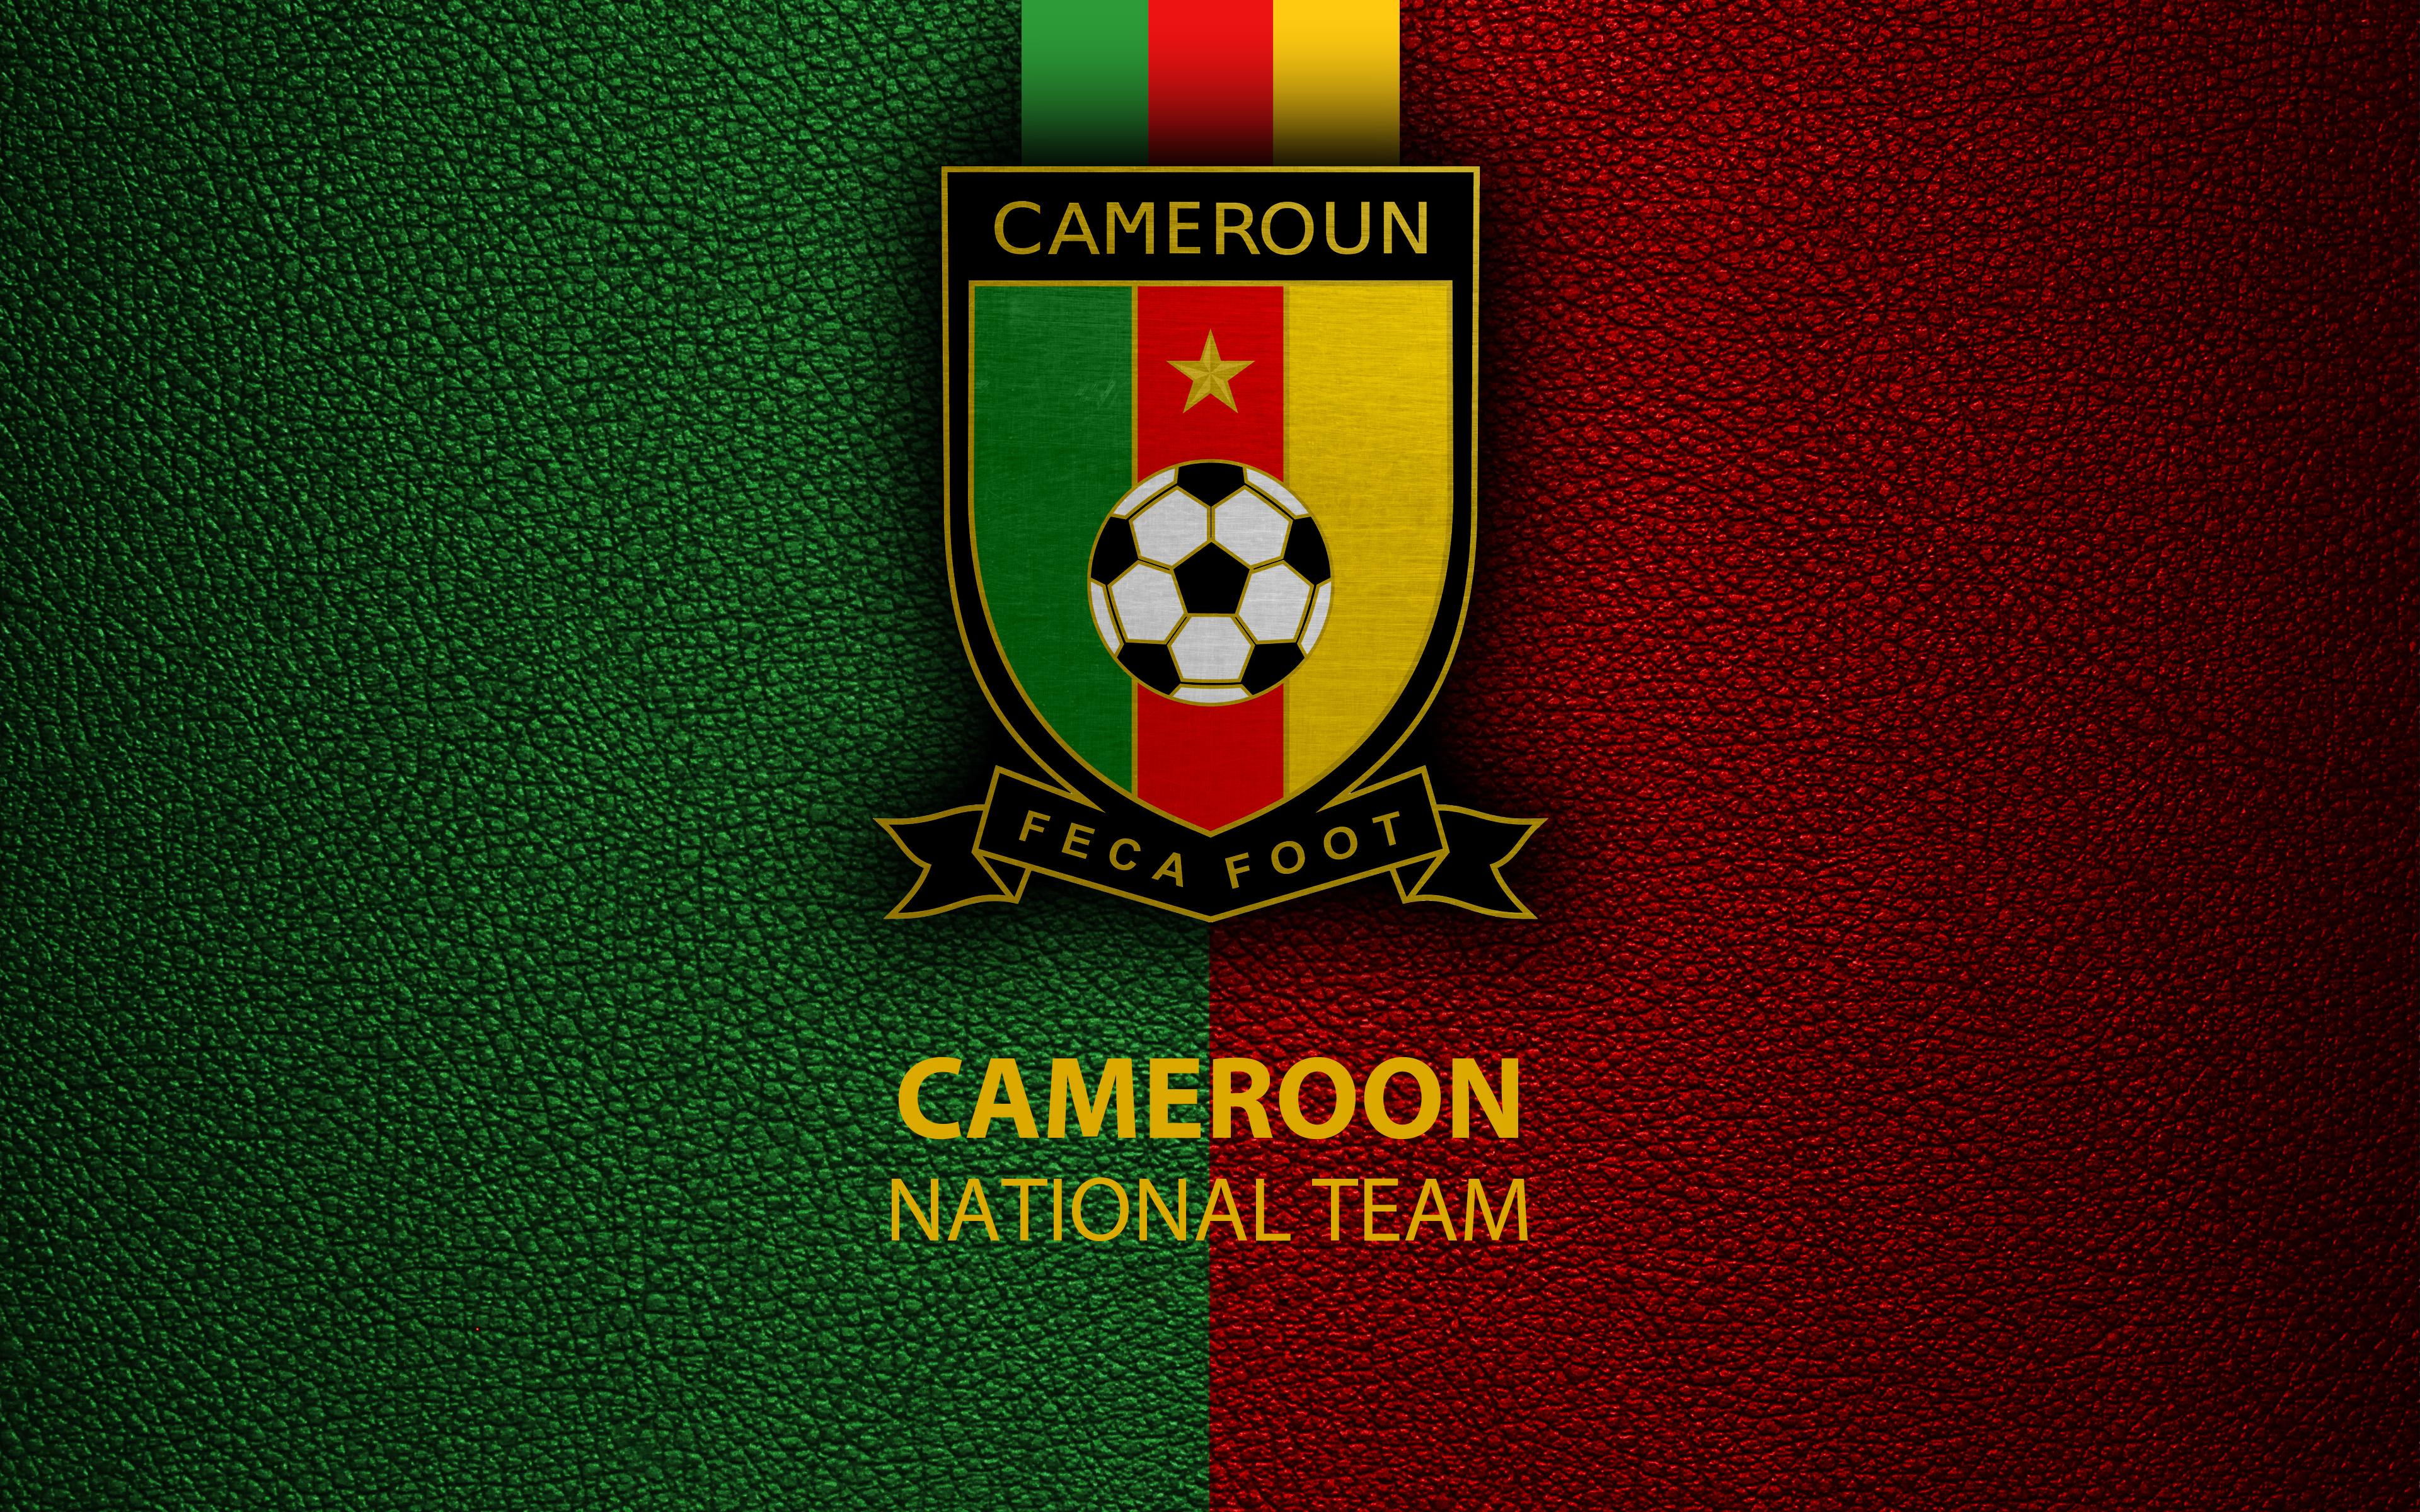 Cameroon National Football Team Teams Background